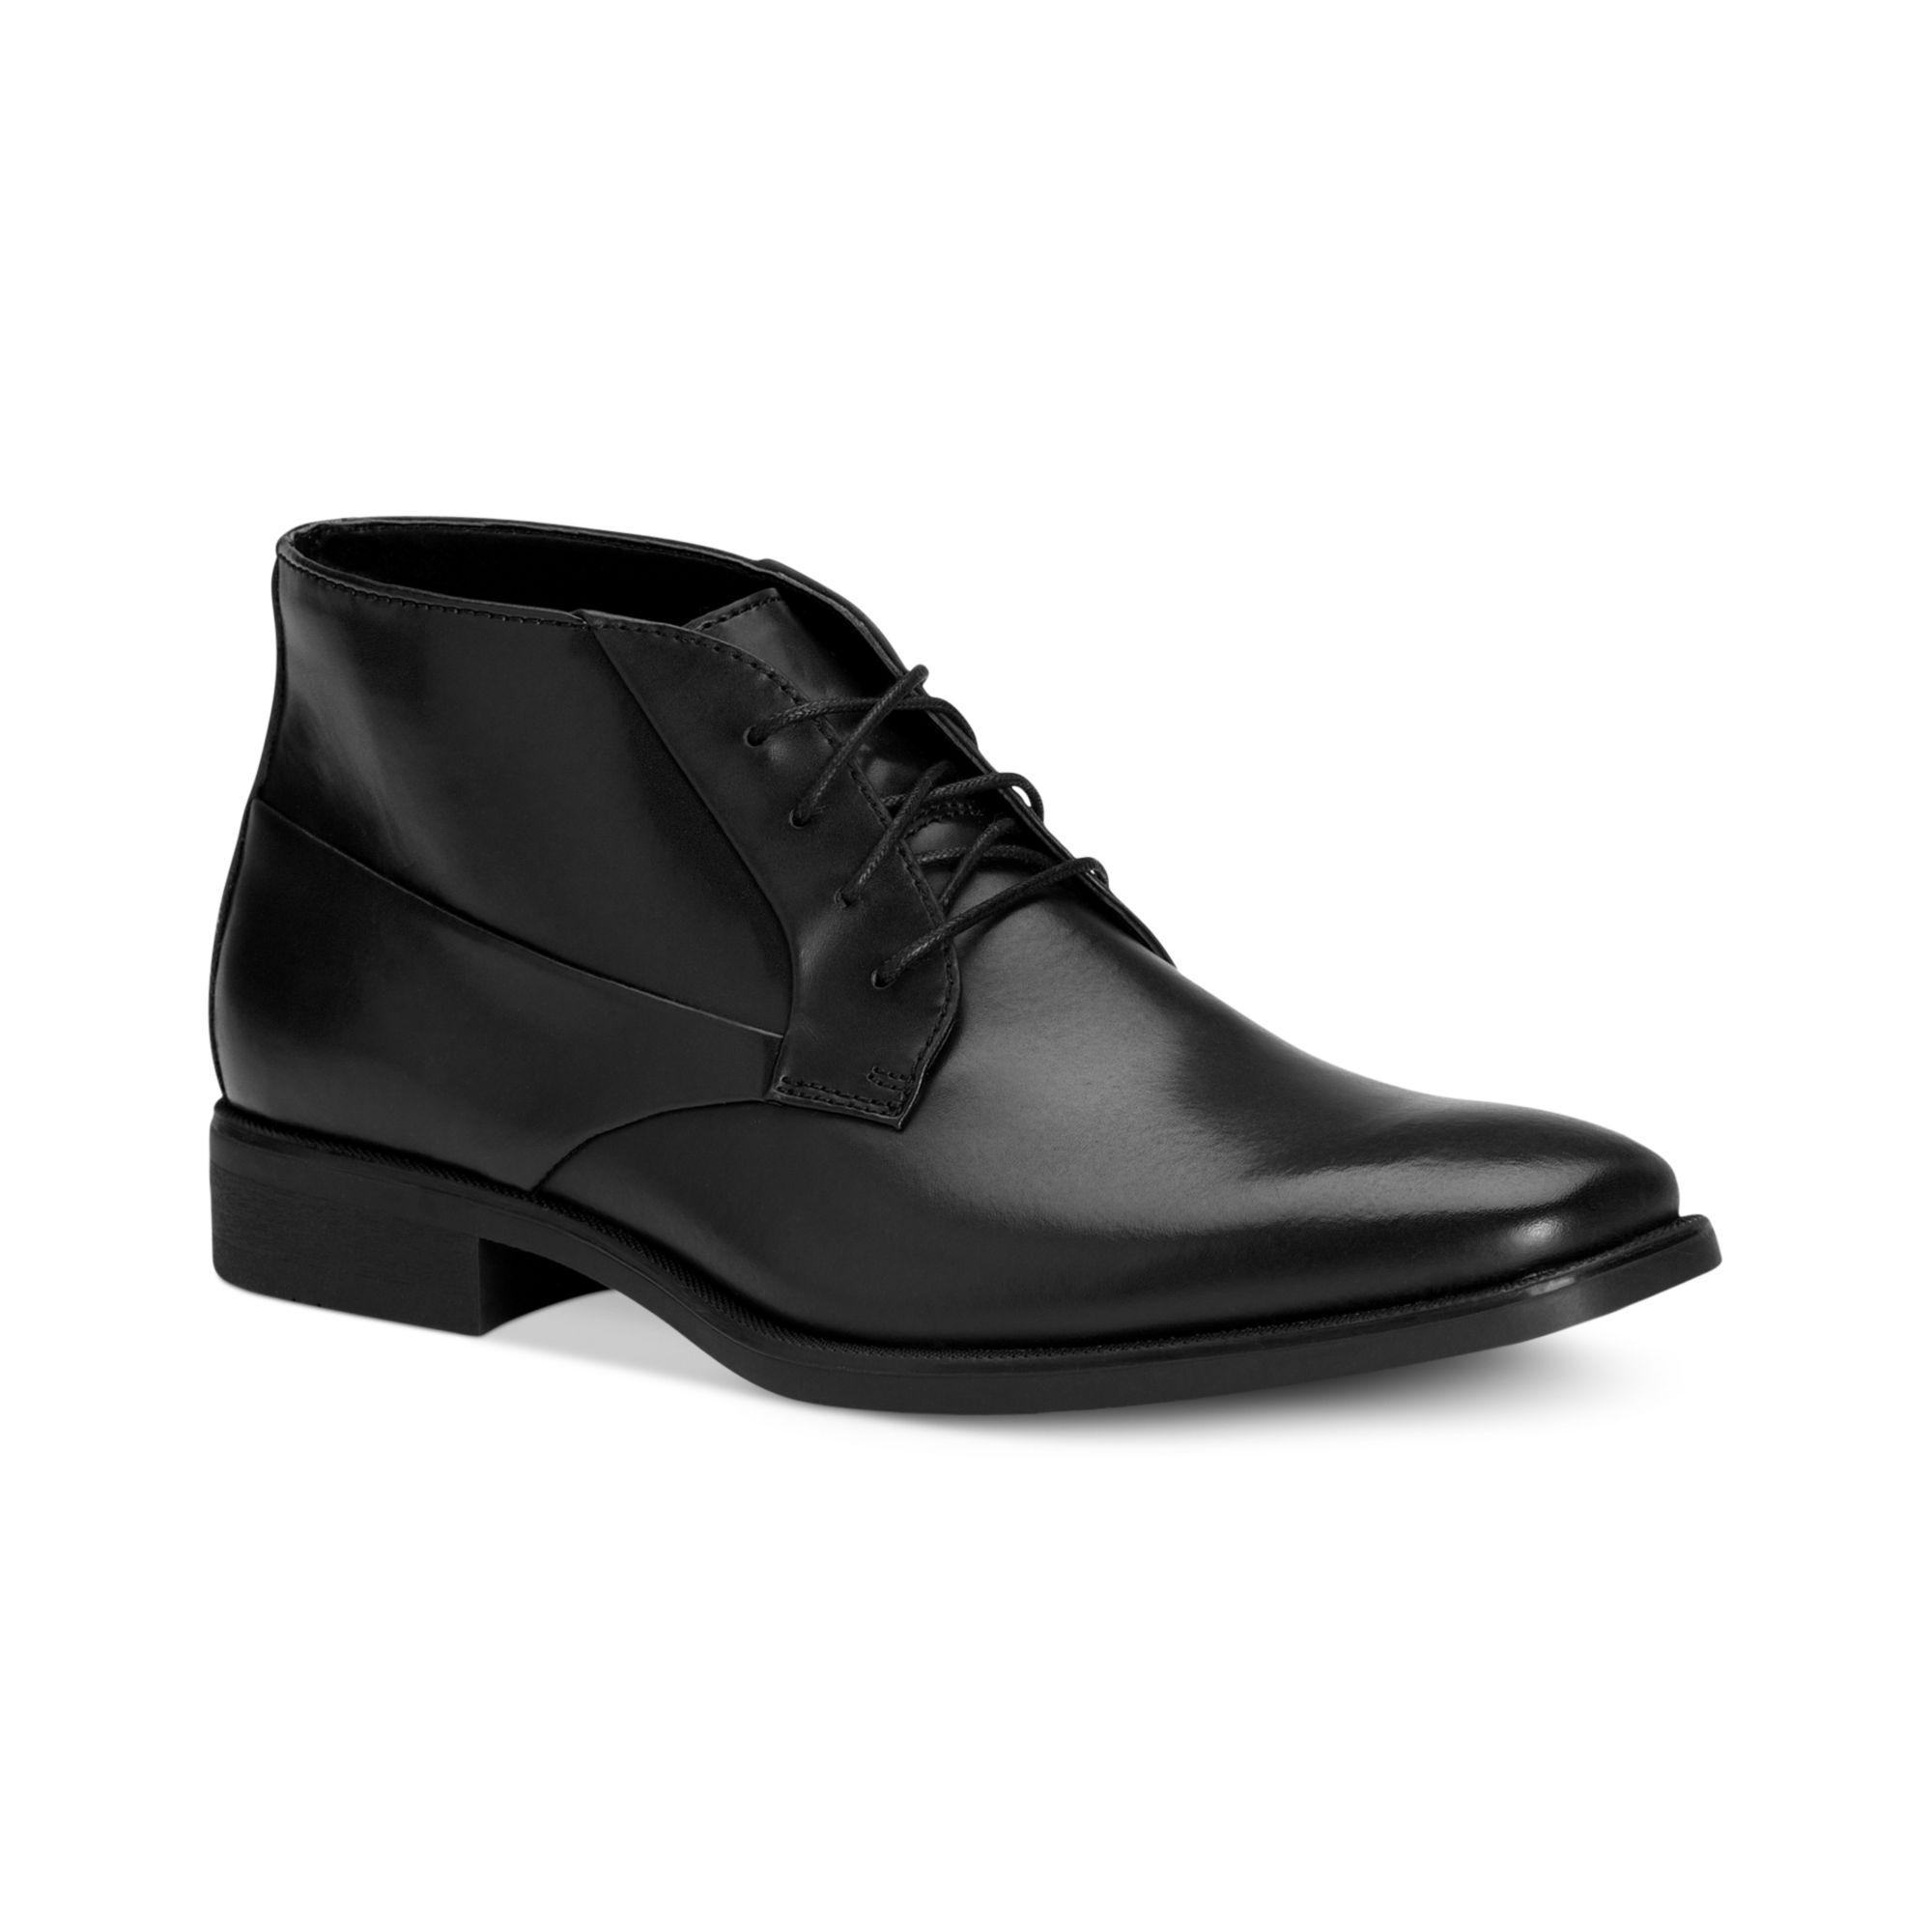 calvin klein elias laceup boots in black for men lyst. Black Bedroom Furniture Sets. Home Design Ideas